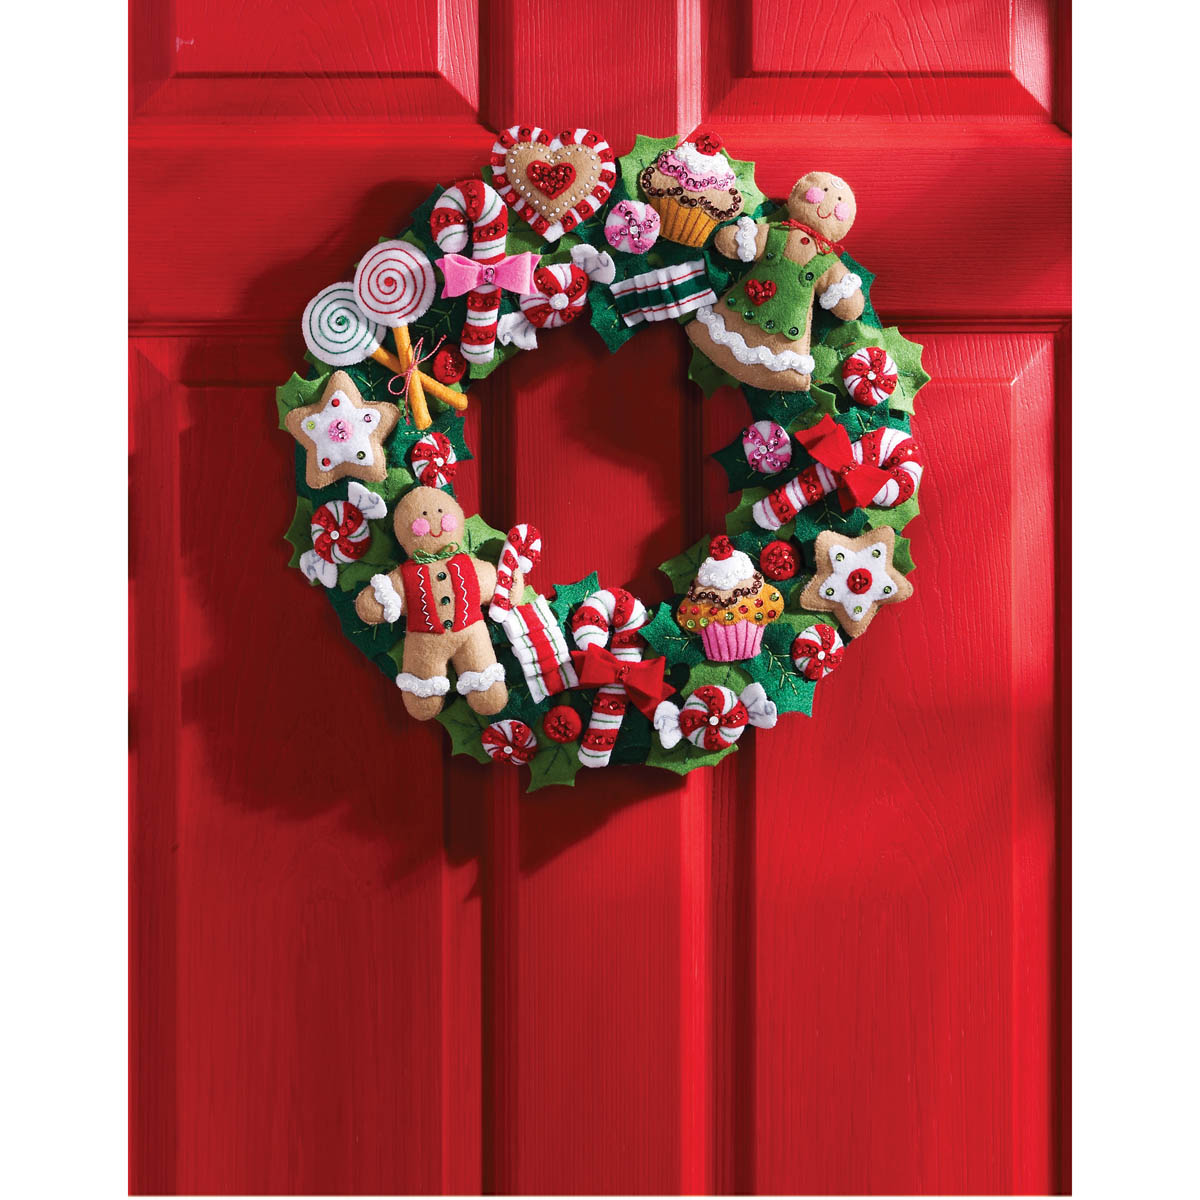 Bucilla ® Seasonal - Felt - Home Decor - Cookies and Candy Wreath